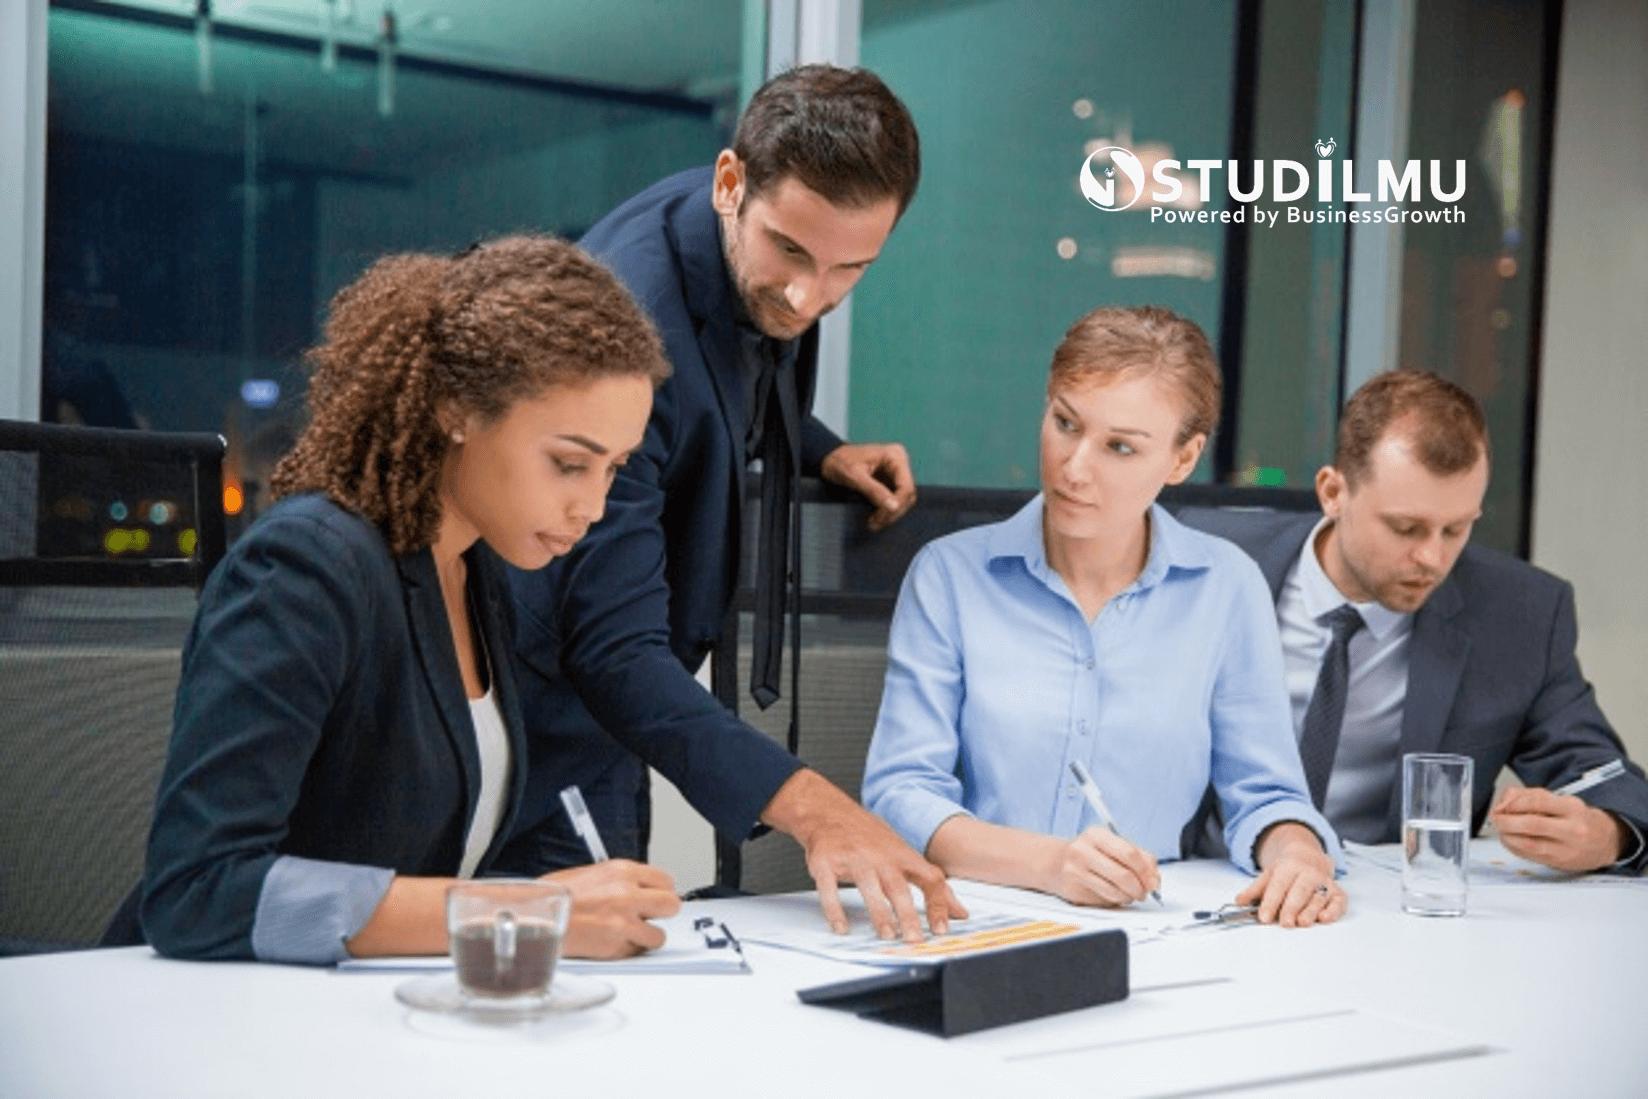 STUDILMU Career Advice - Pemimpin yang Baik untuk Generasi Milenial